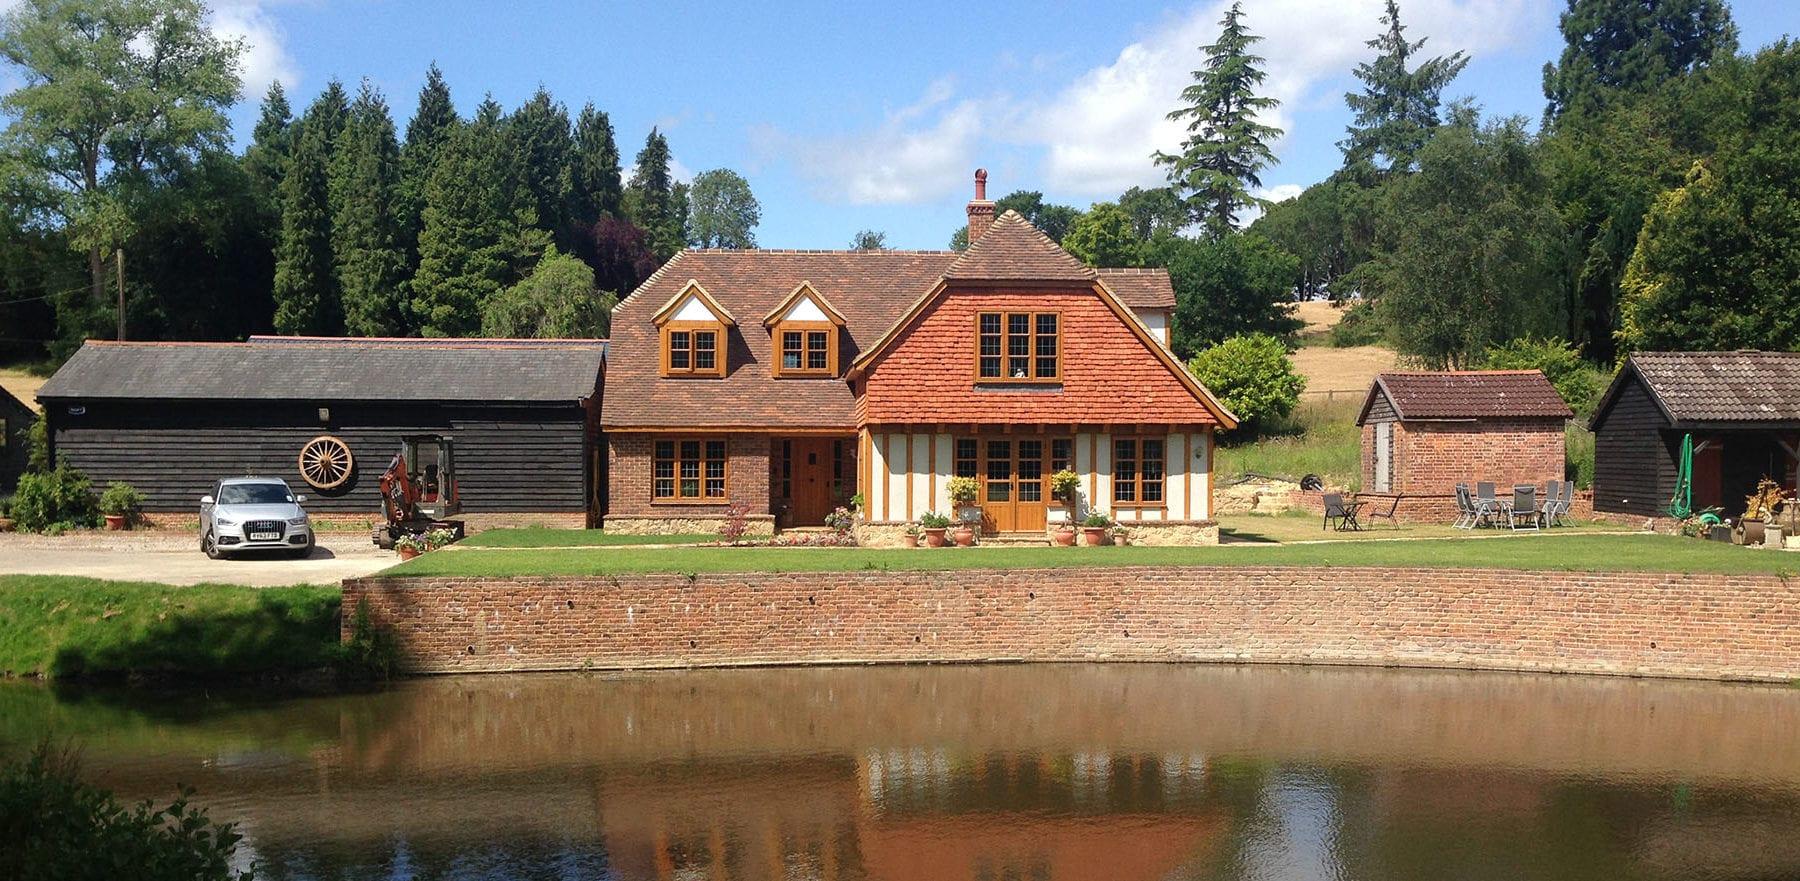 Lifestiles - Handmade Bespoke Clay Roof Tiles - Rotherfield, England 4